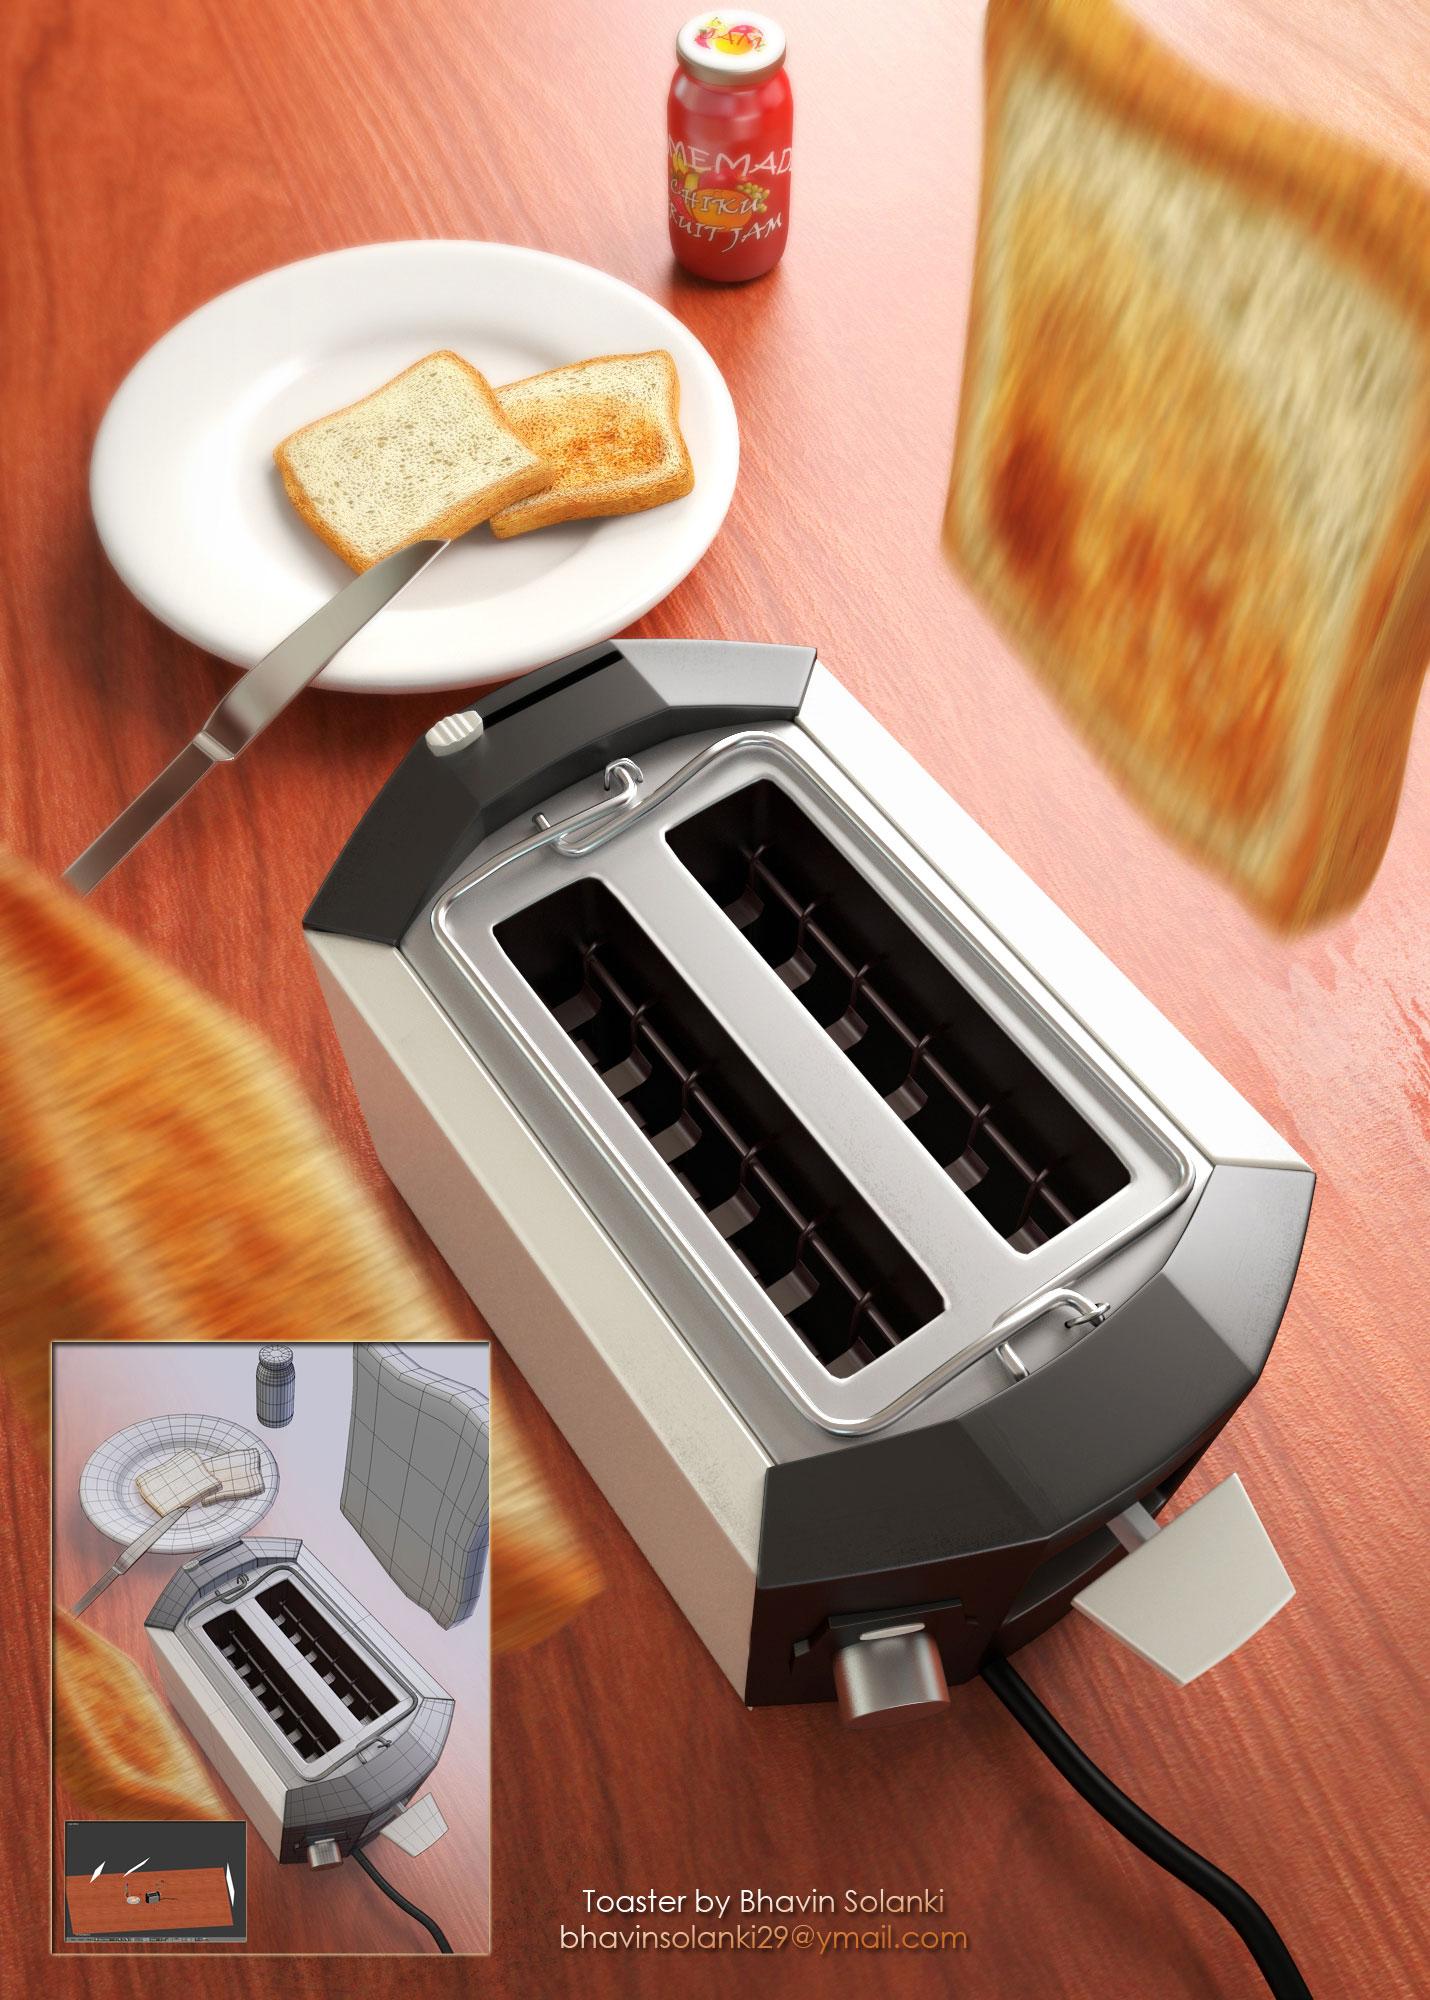 BN_Toaster_High.jpg